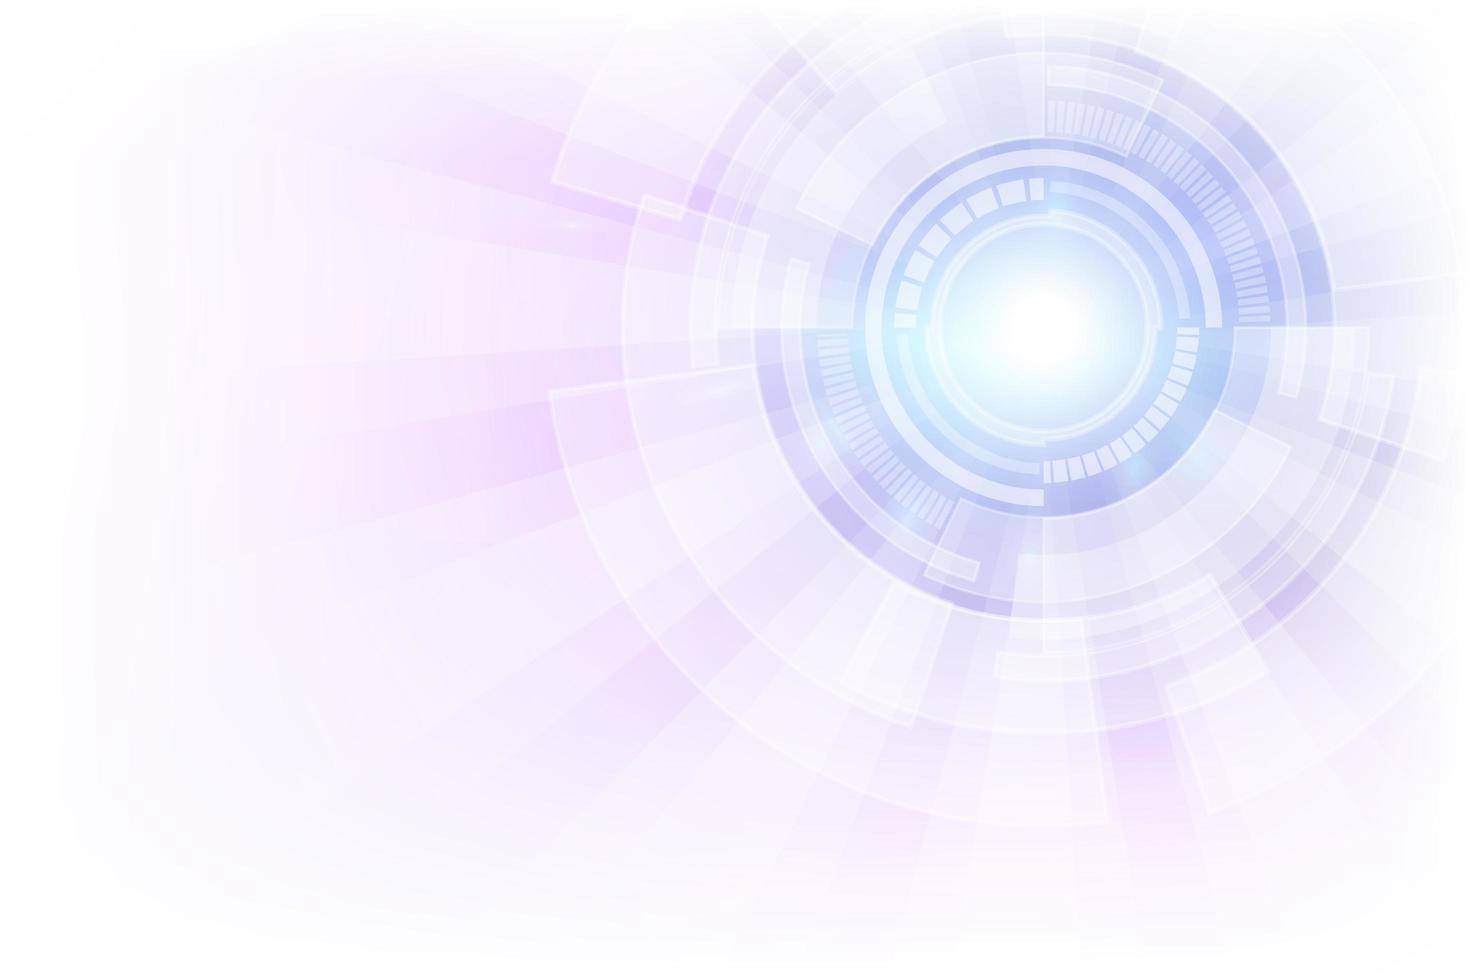 abstrakt teknik koncept bakgrund vektor